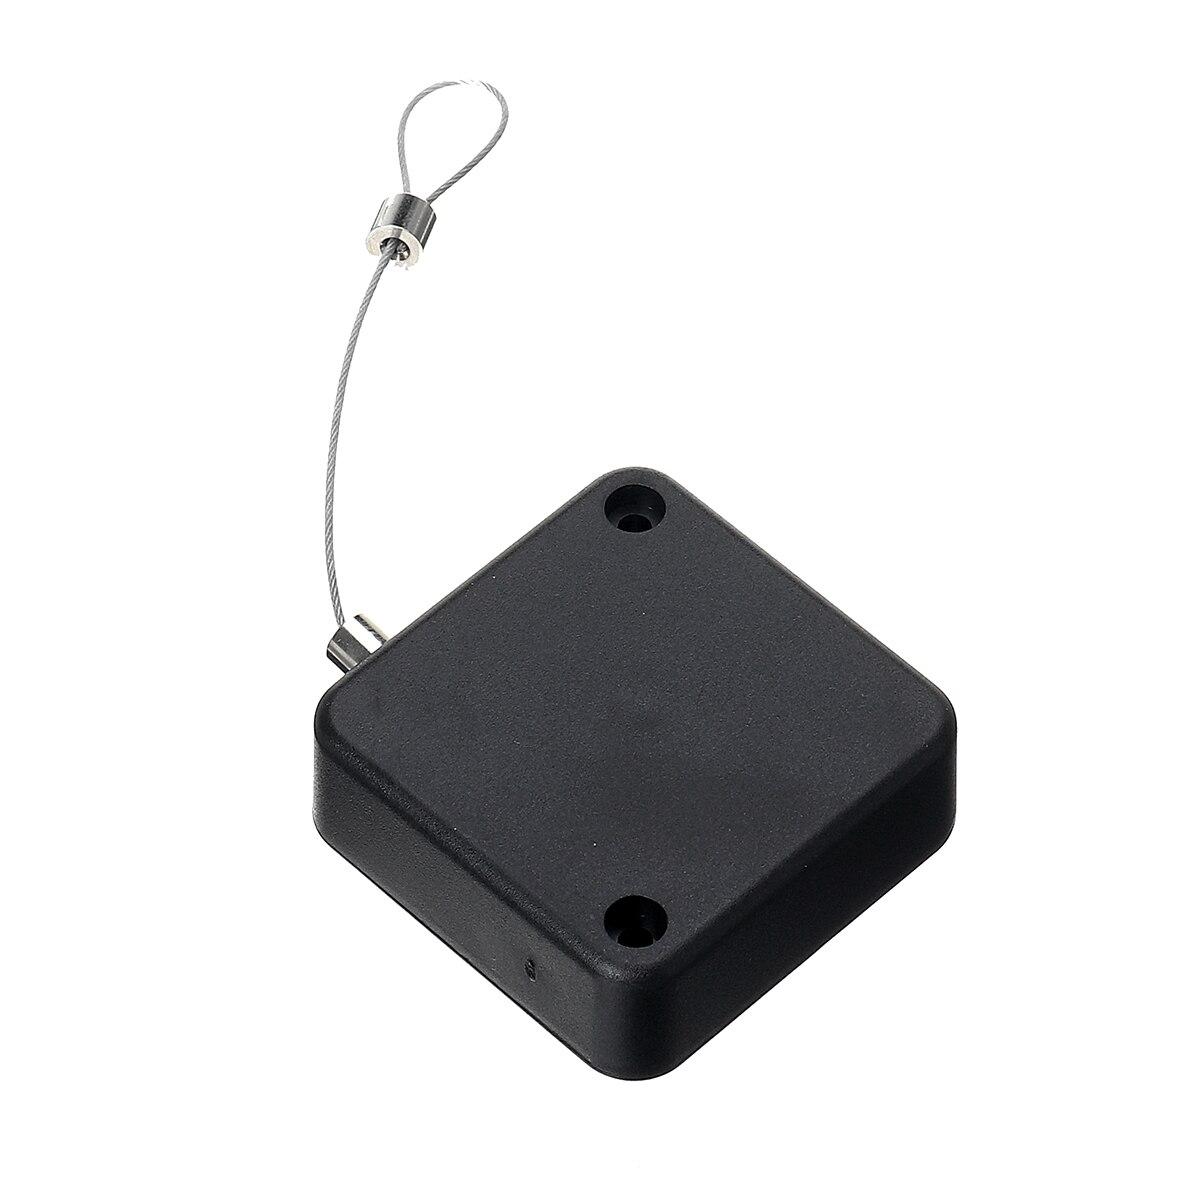 Usb Charging Cable 16W 8800mah EU Plug Flashlight LED Display Dust-proof Design